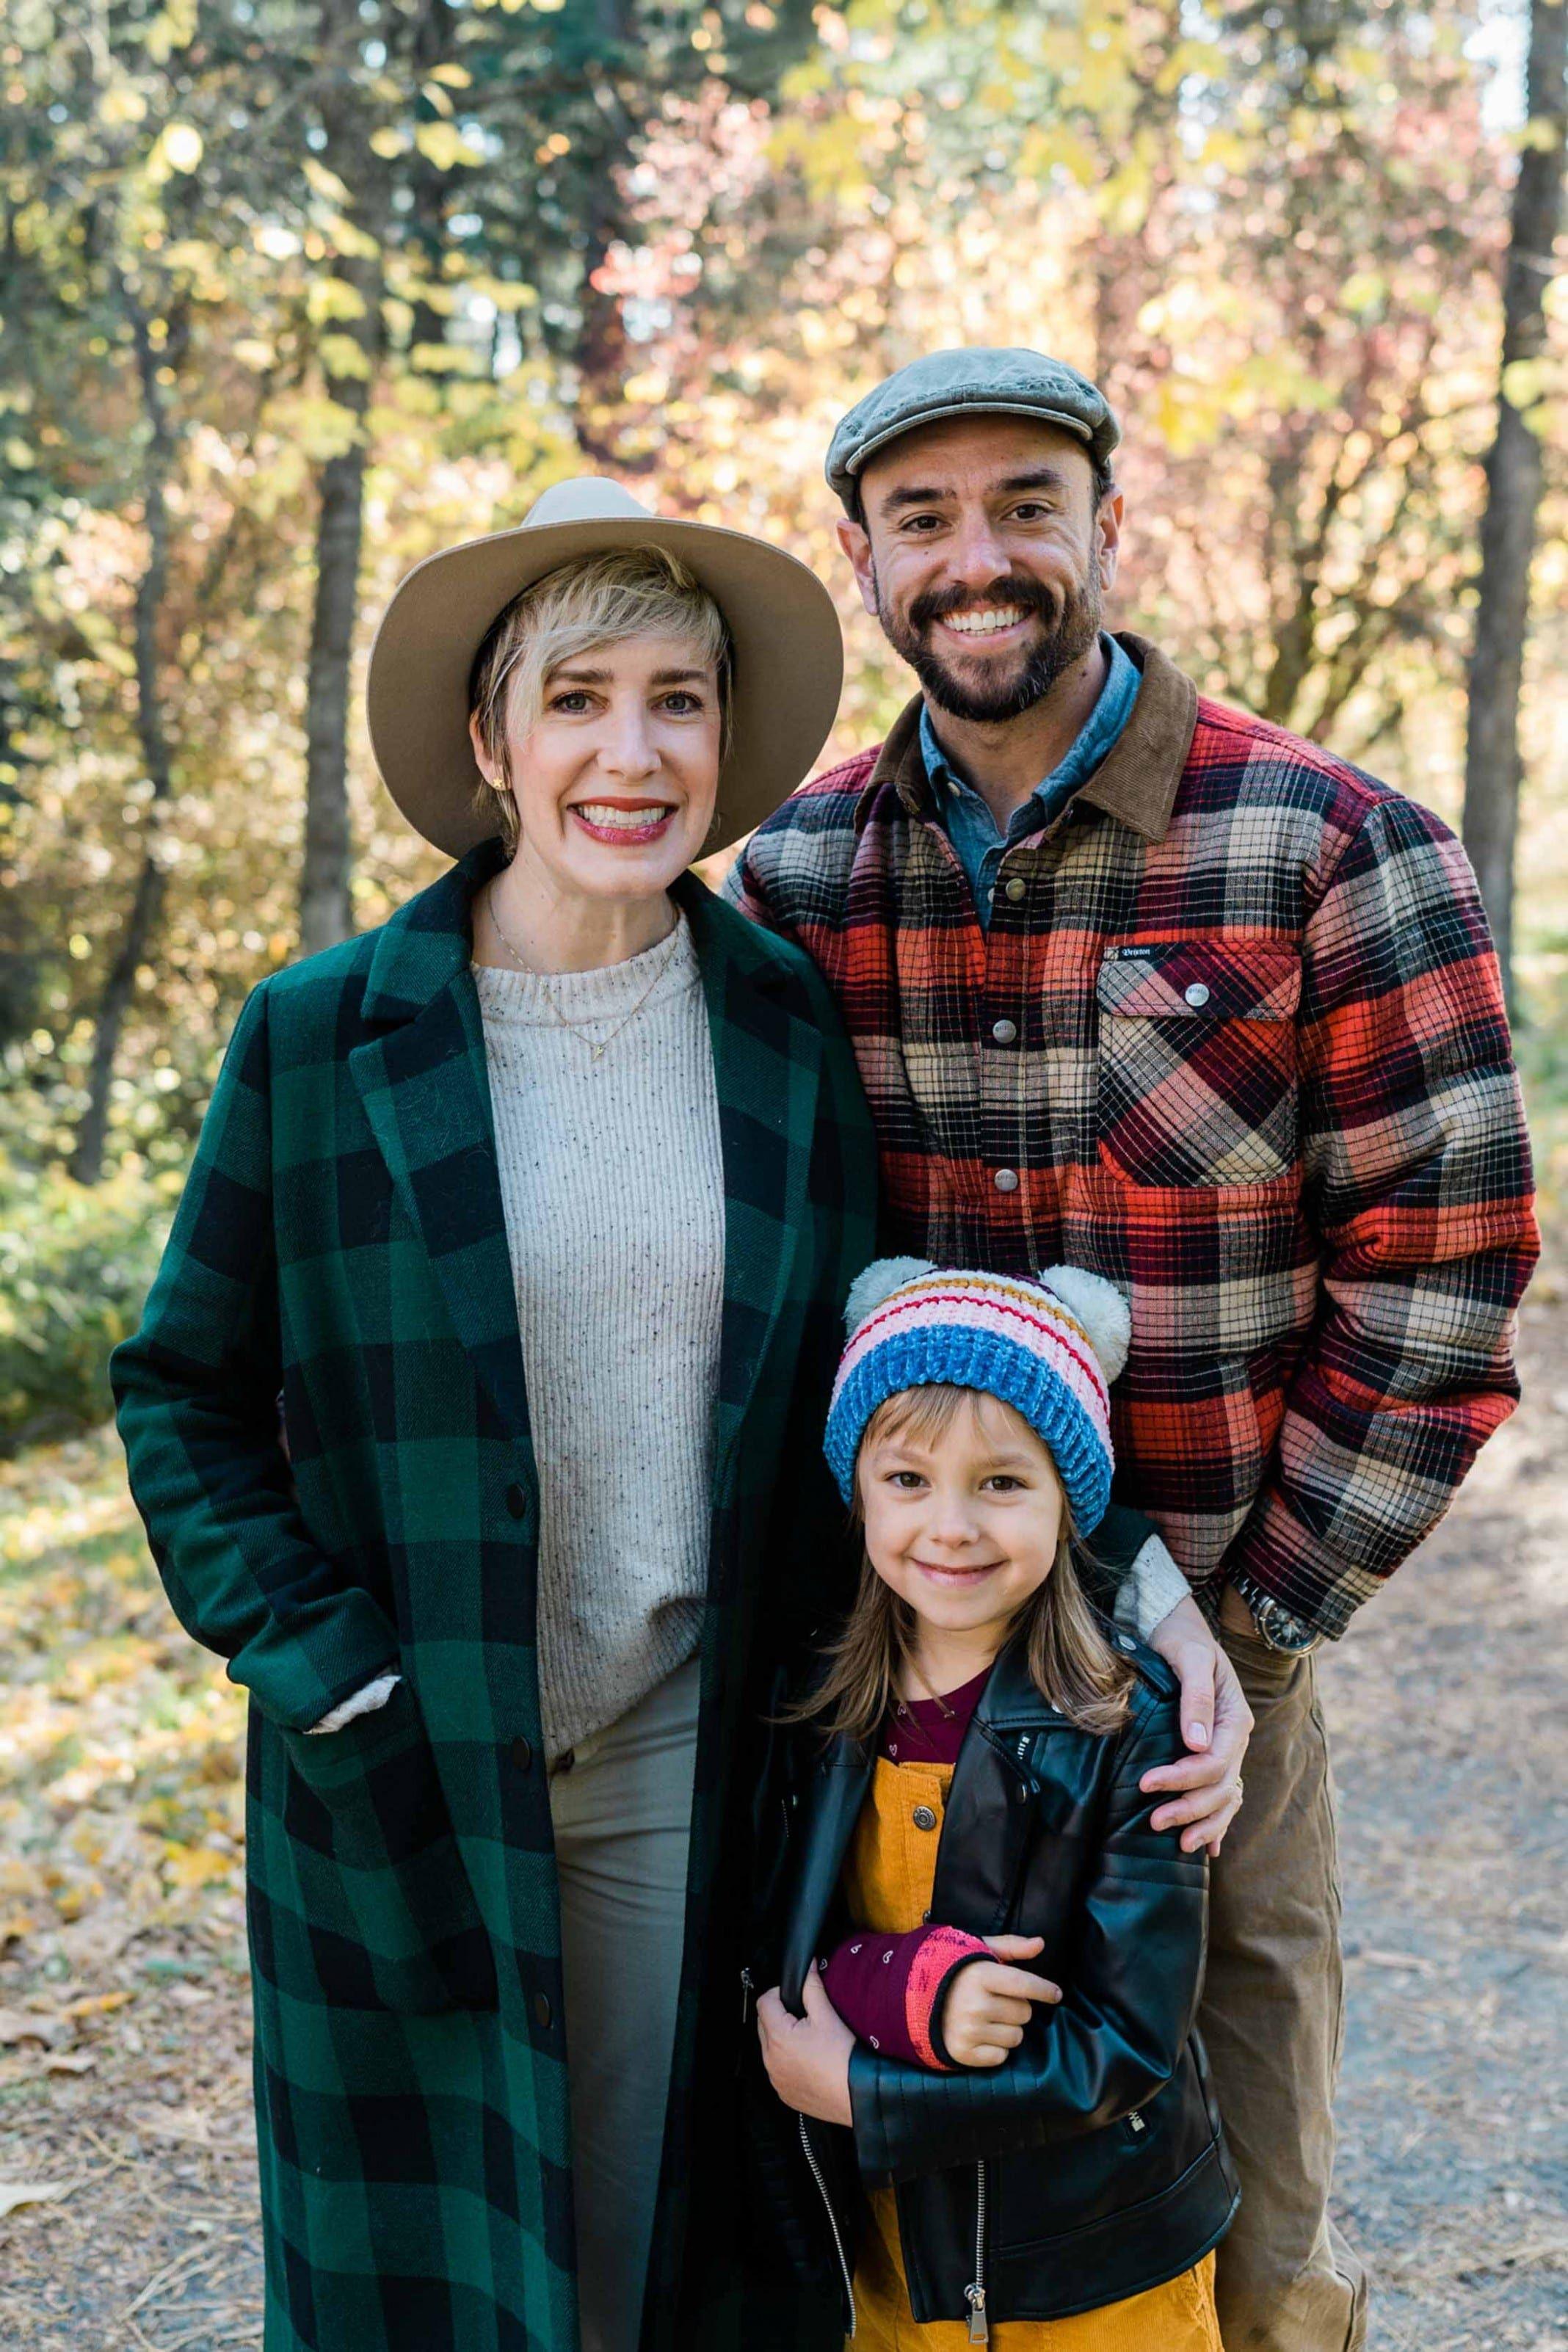 Holiday Photoshoot Inspo #familyphotooutfits